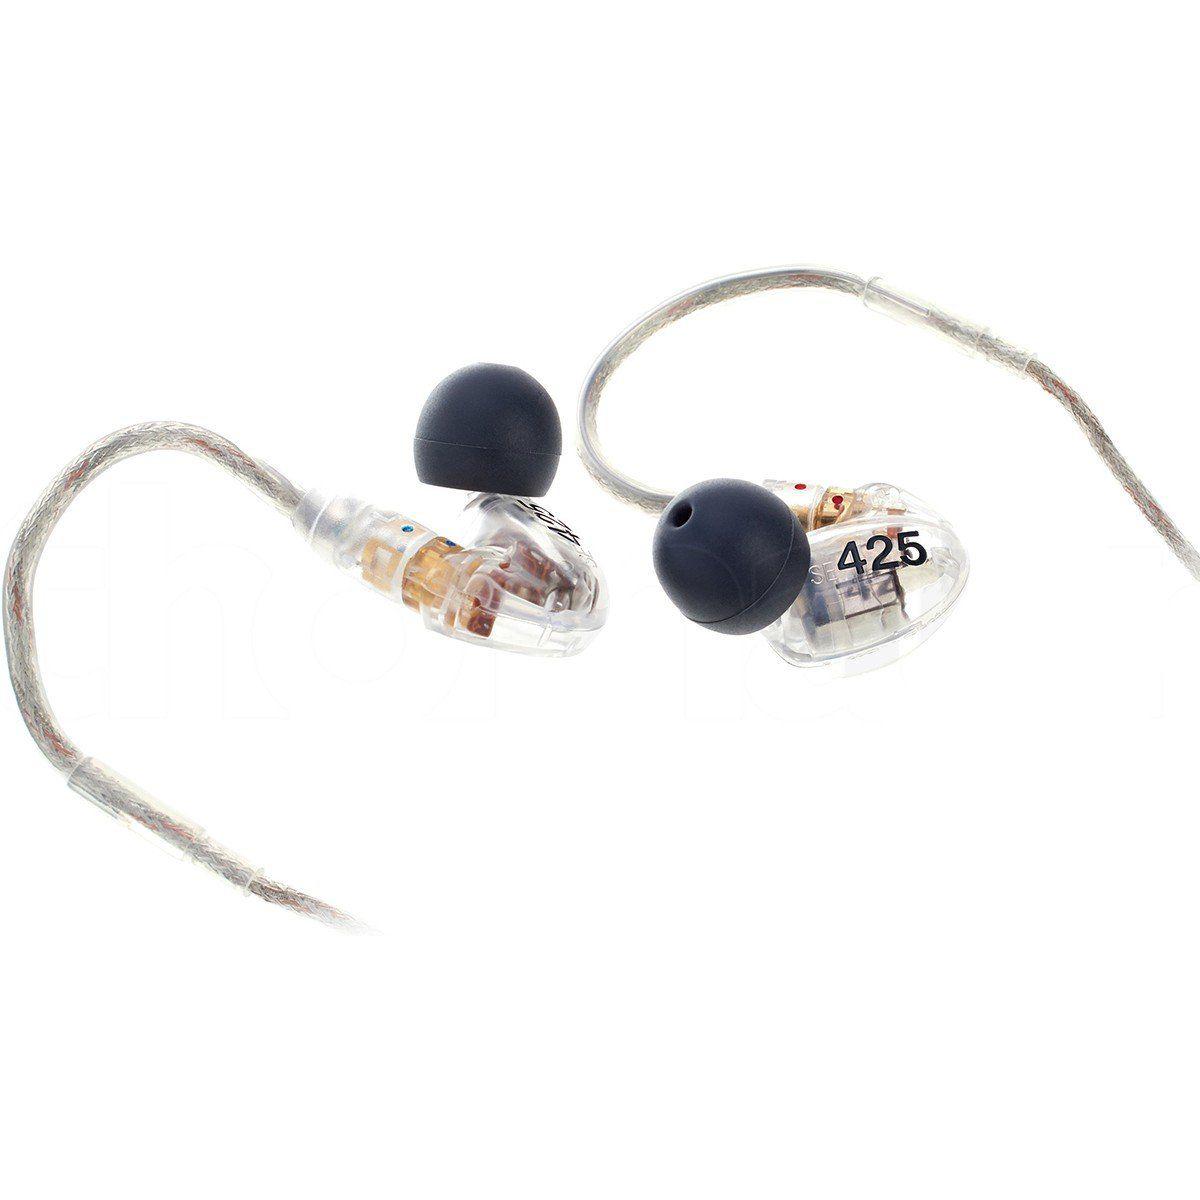 Shure SE425-CL Fone de Ouvido SE-425CL In-Ear para Tablets Notebooks e Retorno